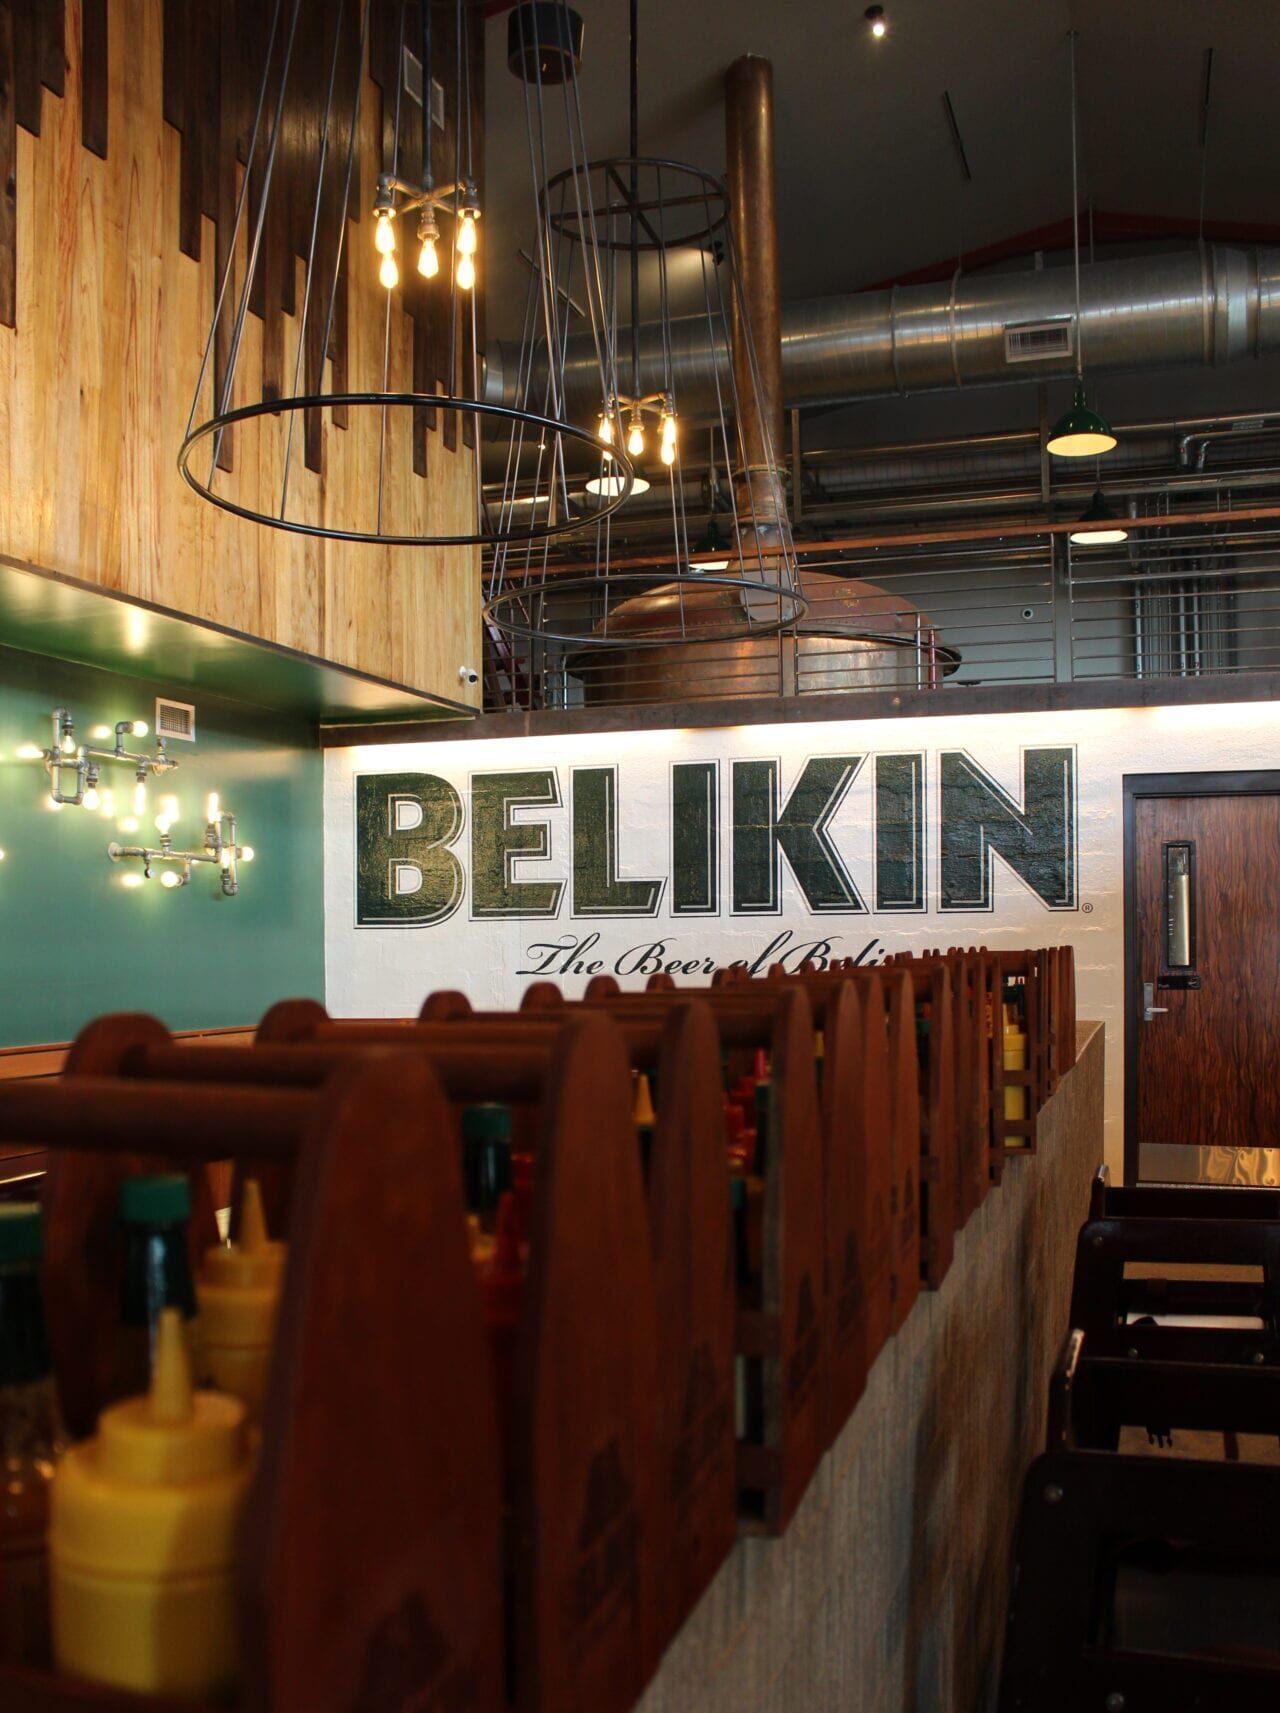 di-bruwry-draft-belikin-beer-belize-city-restaurant